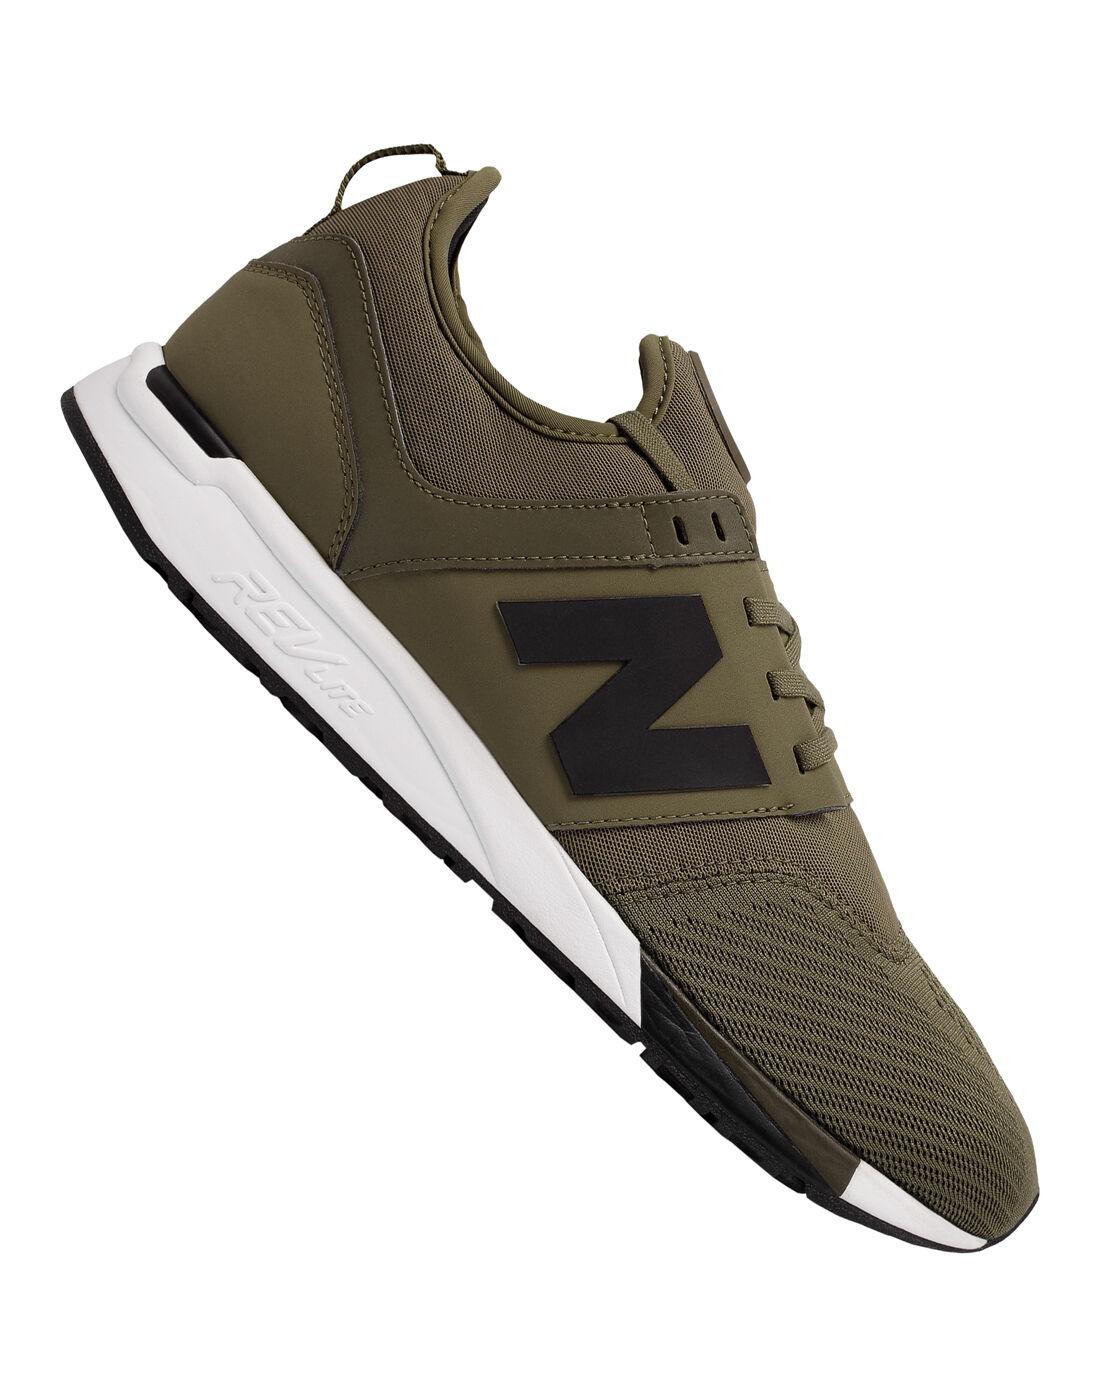 New Balance Mens 247 Trainer